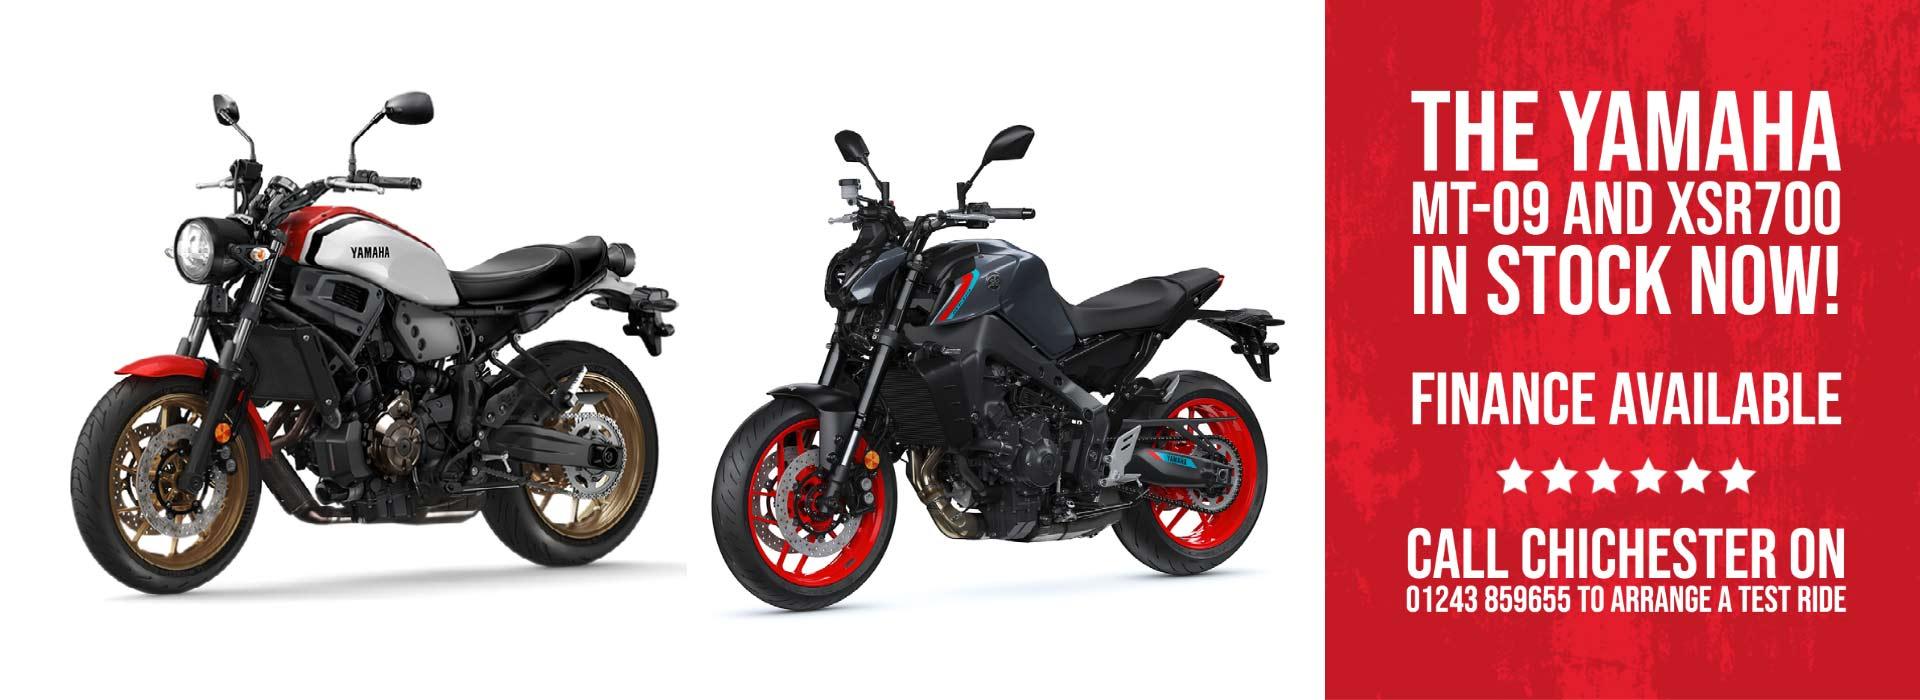 Yamaha MT-09 and MT-07 Motorcycles